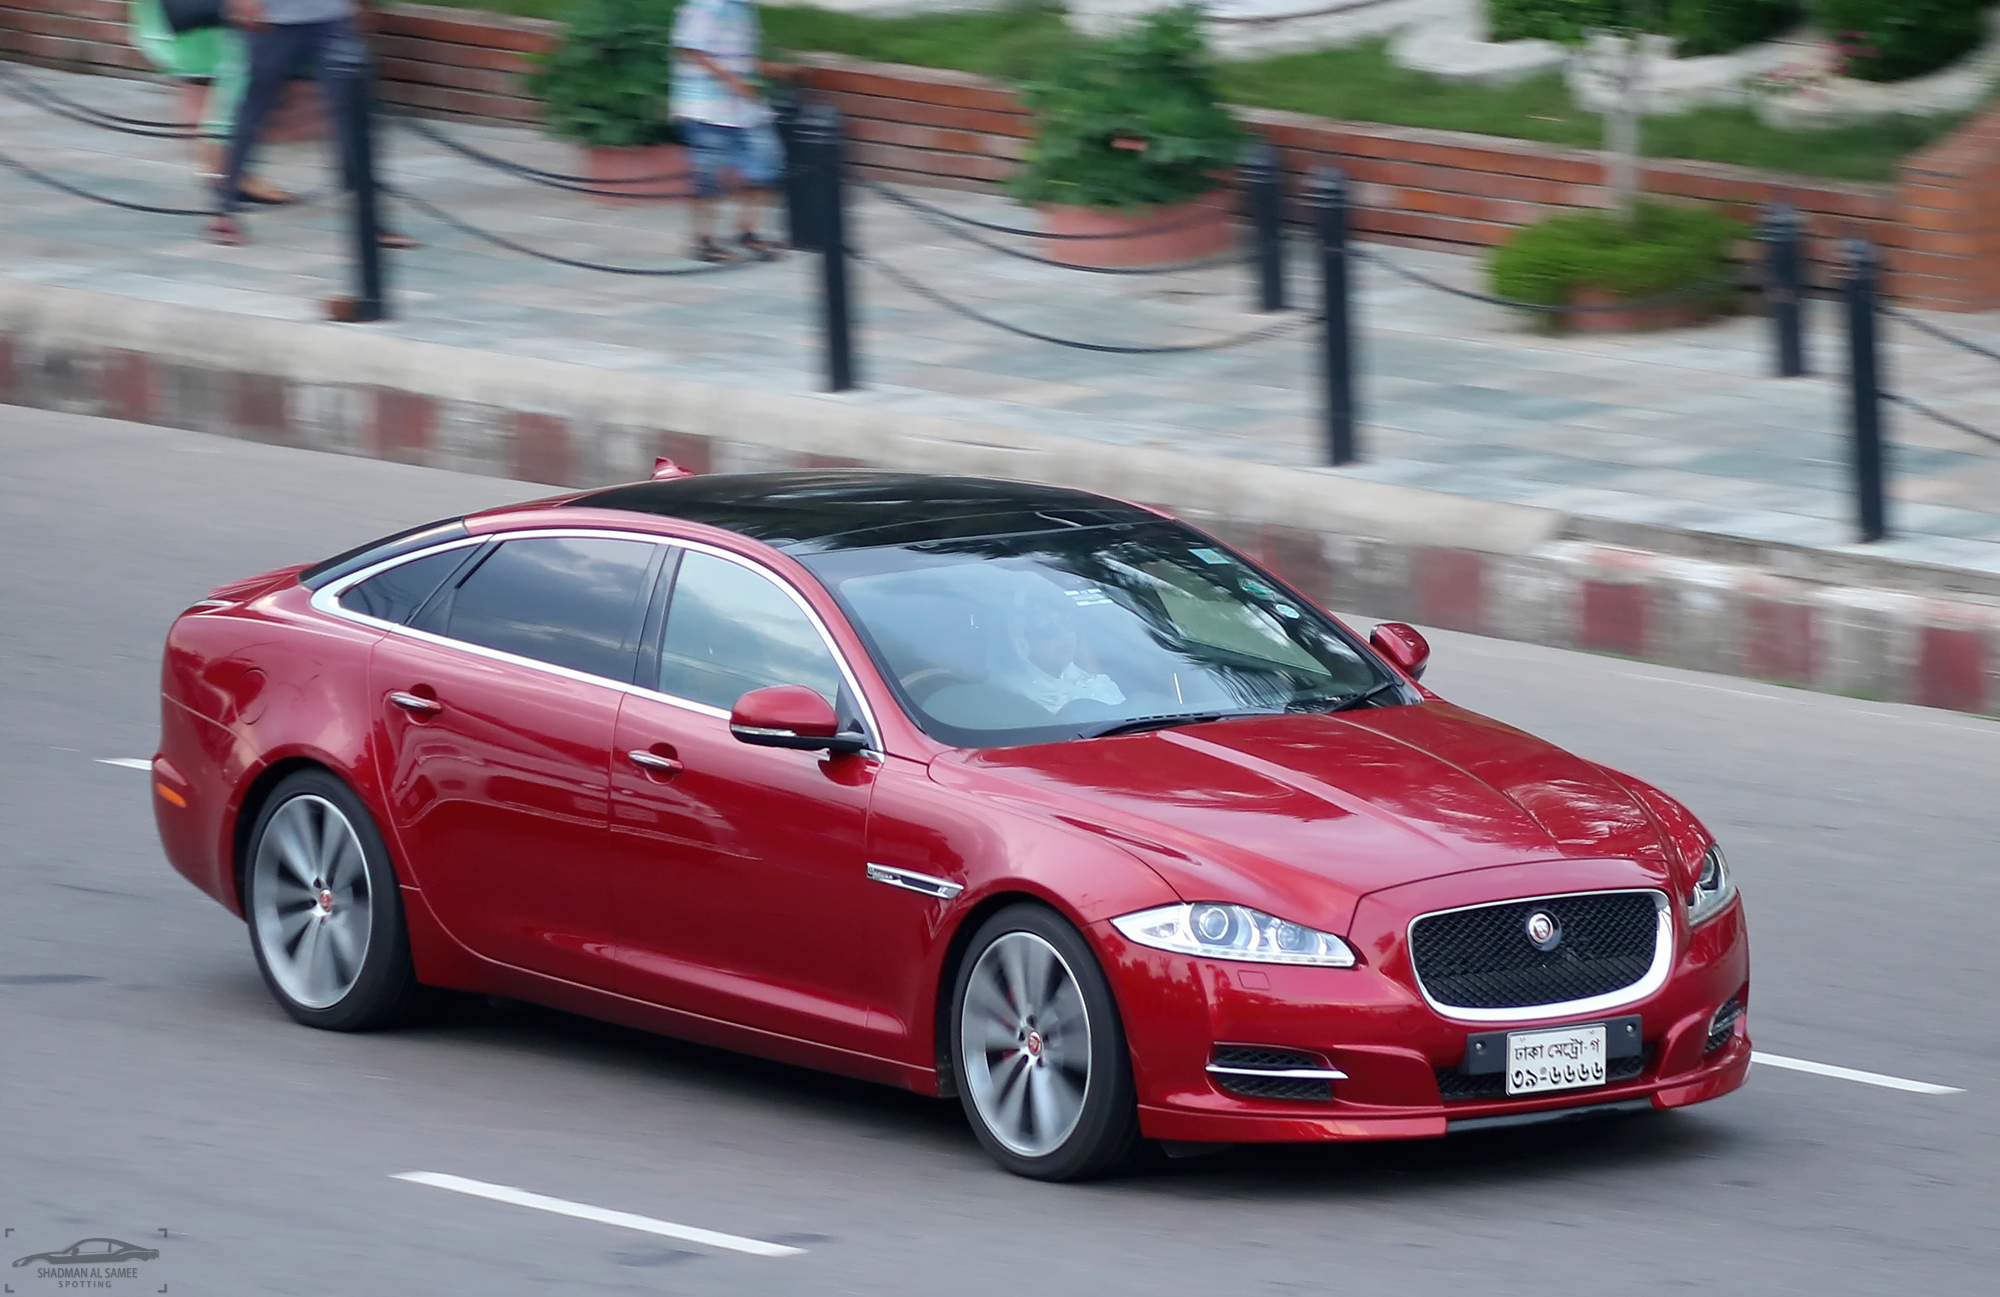 Jaguar xj 3.0 td at portfolio swb (02.2016 - н.в.) - технические характеристики